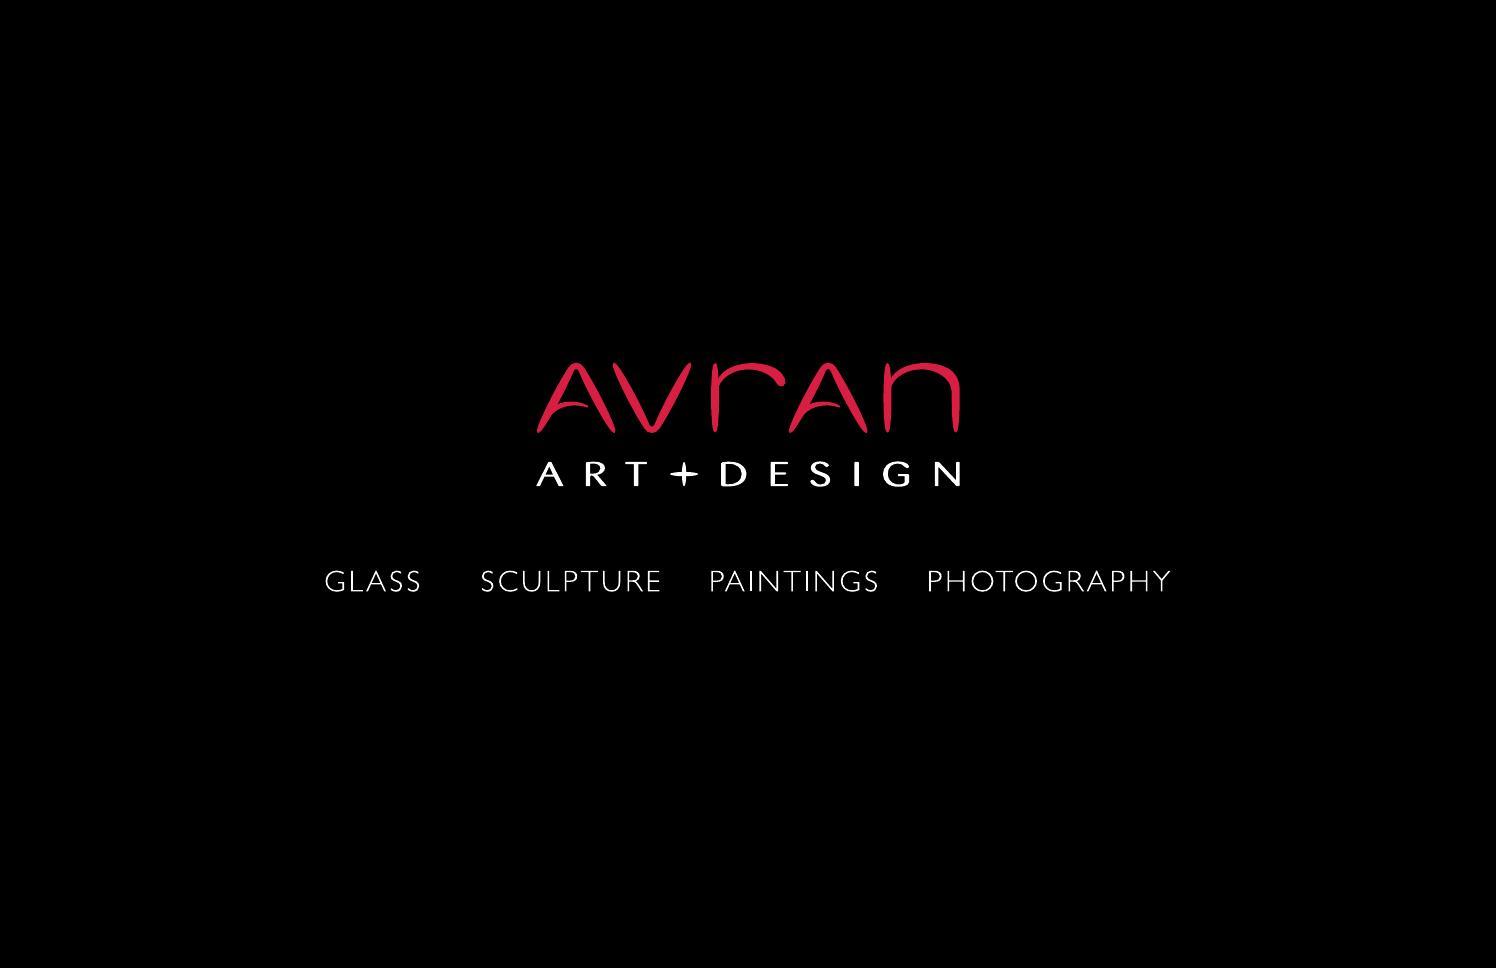 Avran Art Design 2014 By Avran Fine Art Issuu